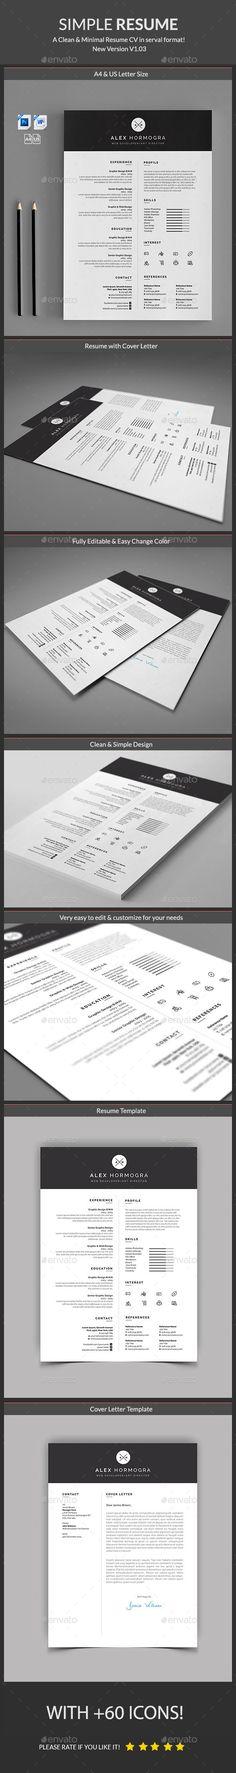 Resume Template PSD, MS Word. Download here: https://graphicriver.net/item/resume/17166267?ref=ksioks